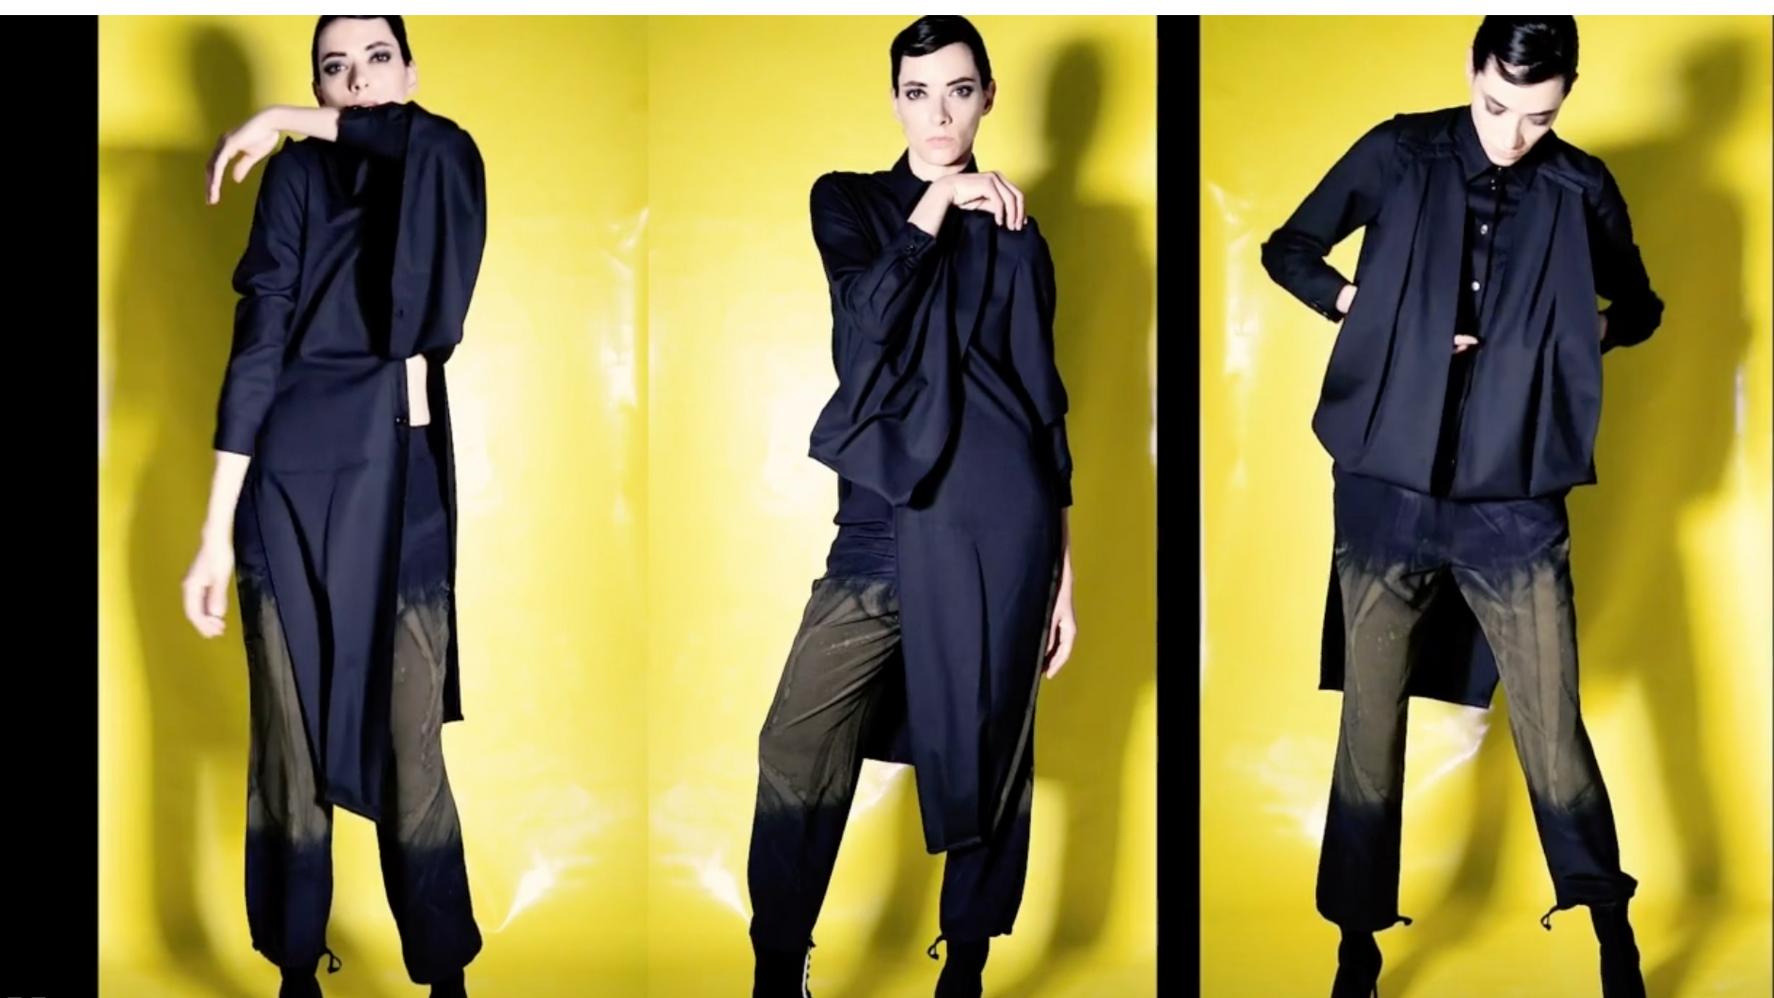 Video by Anna Bertozzi Styling Elisa Bacchi Model Giordana Vasquez for #PierAntonioGaspari